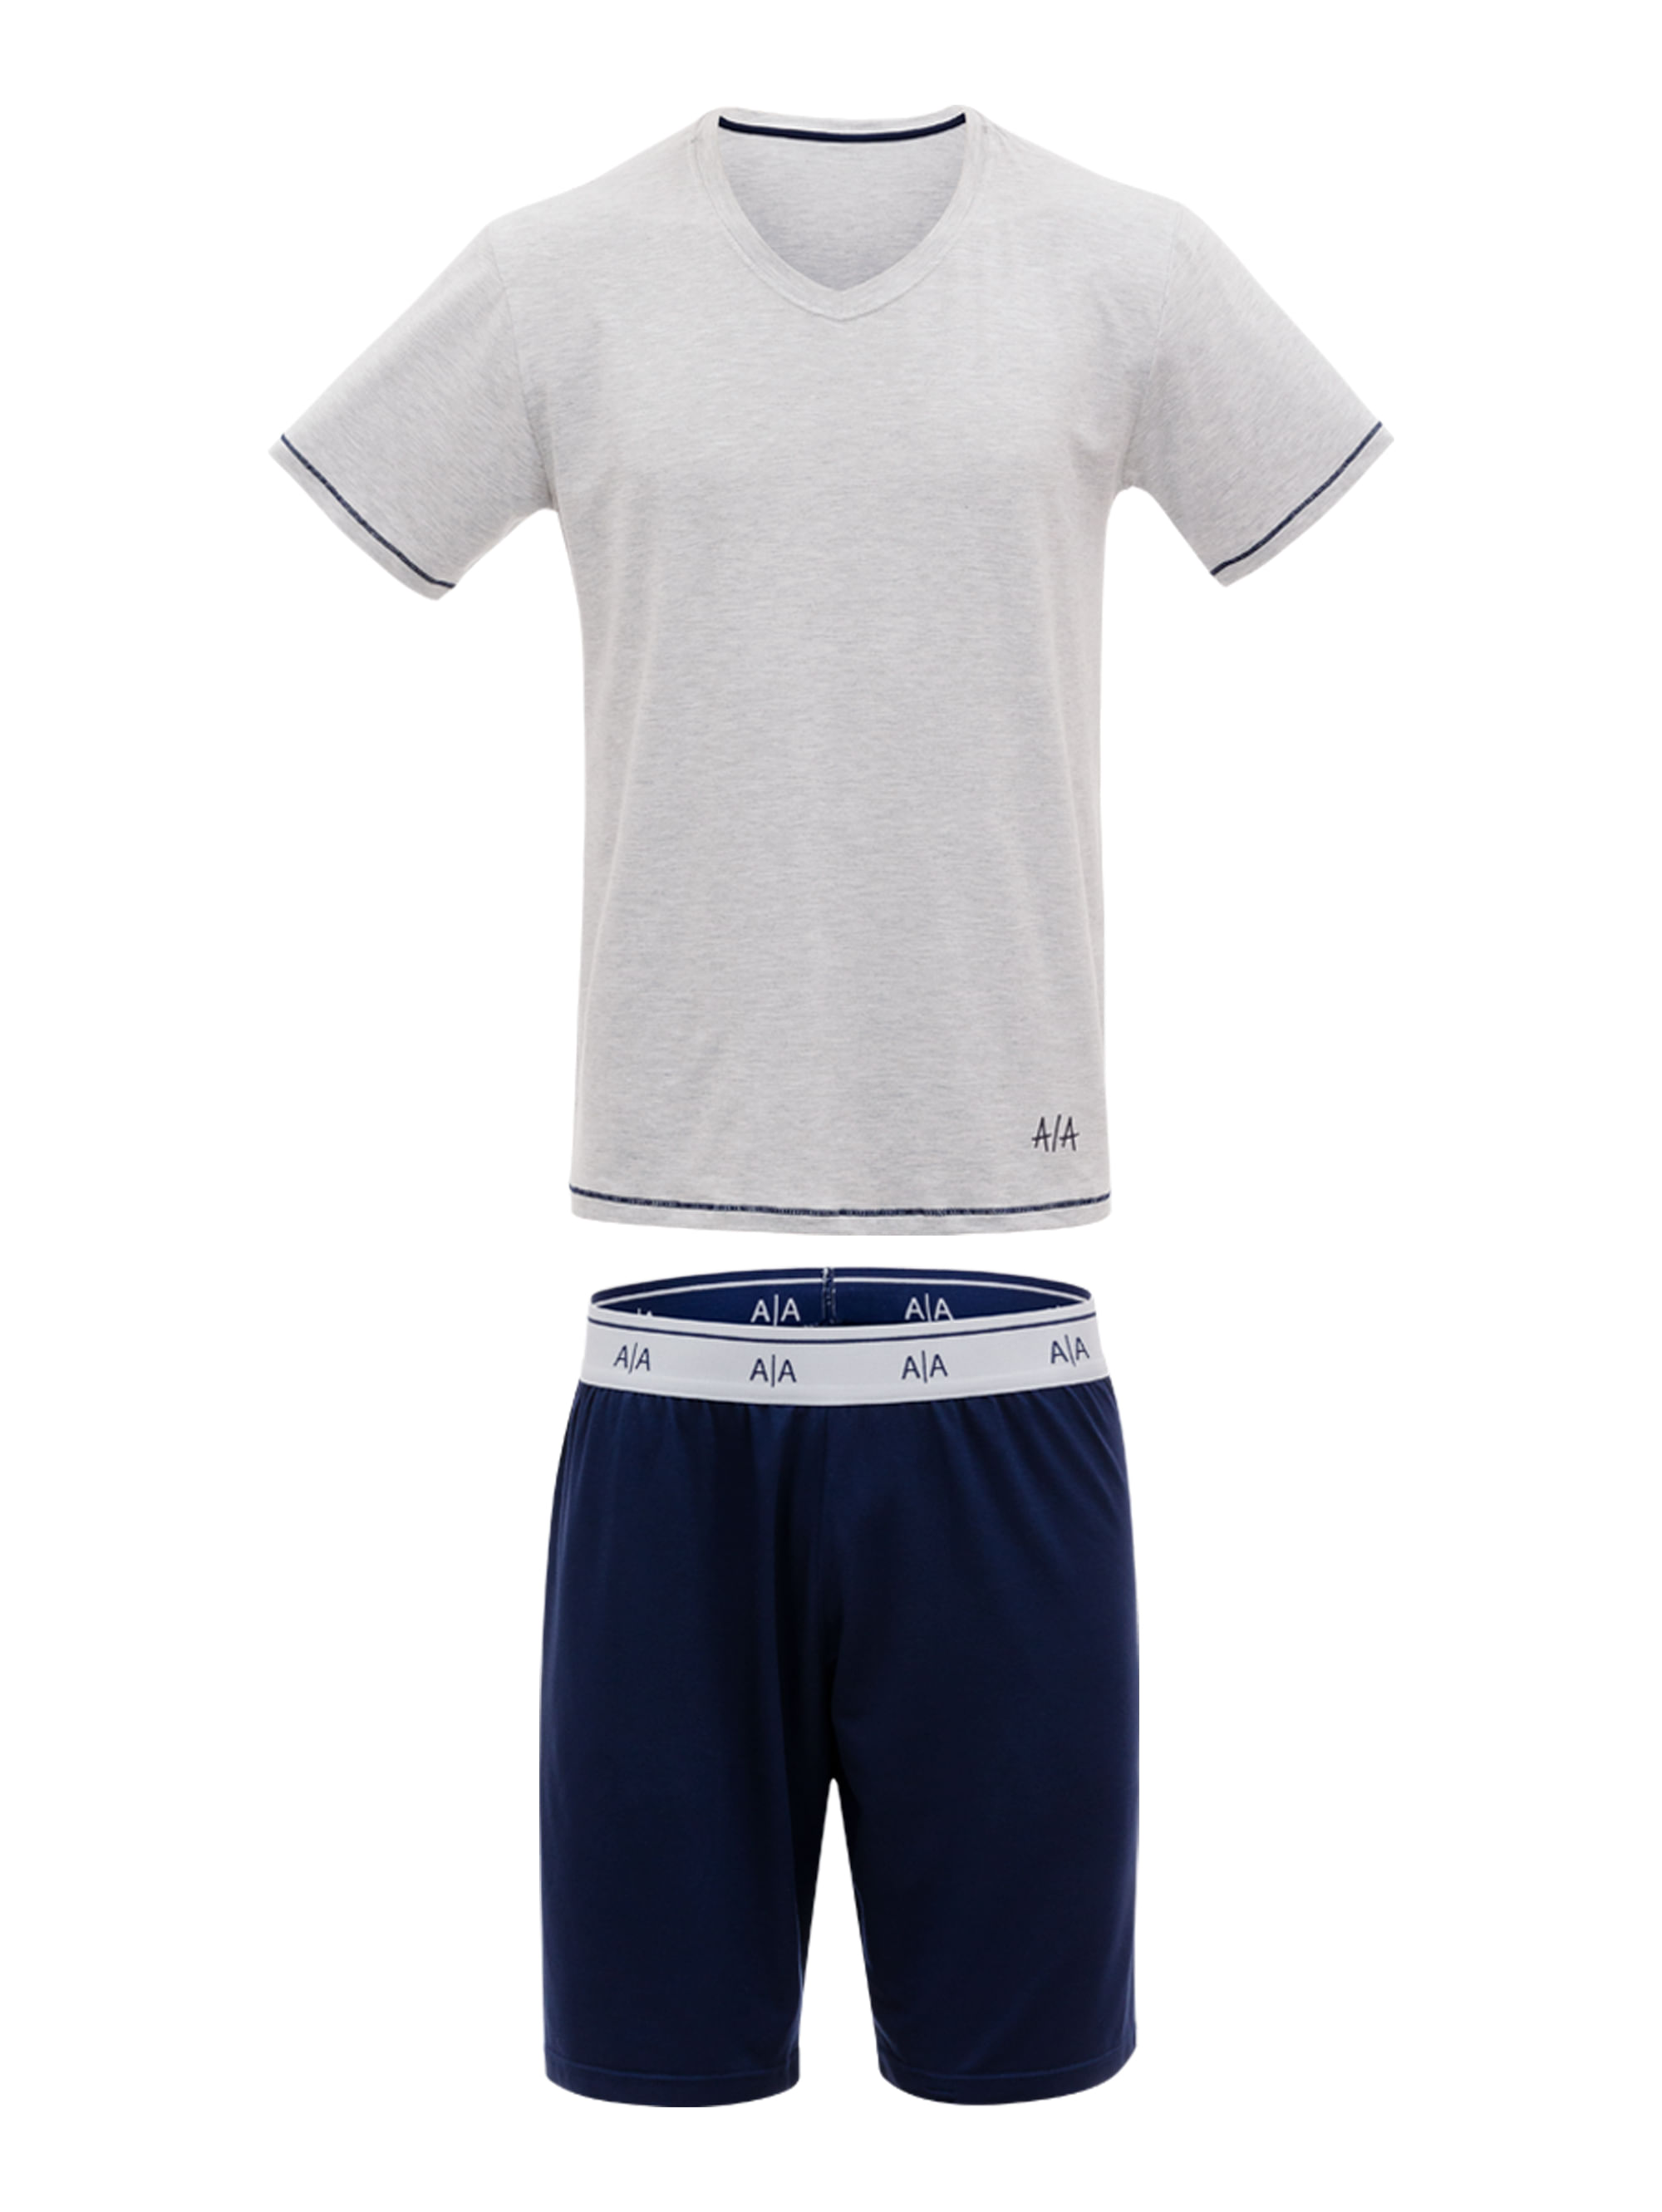 pijama masculino manga curta joao